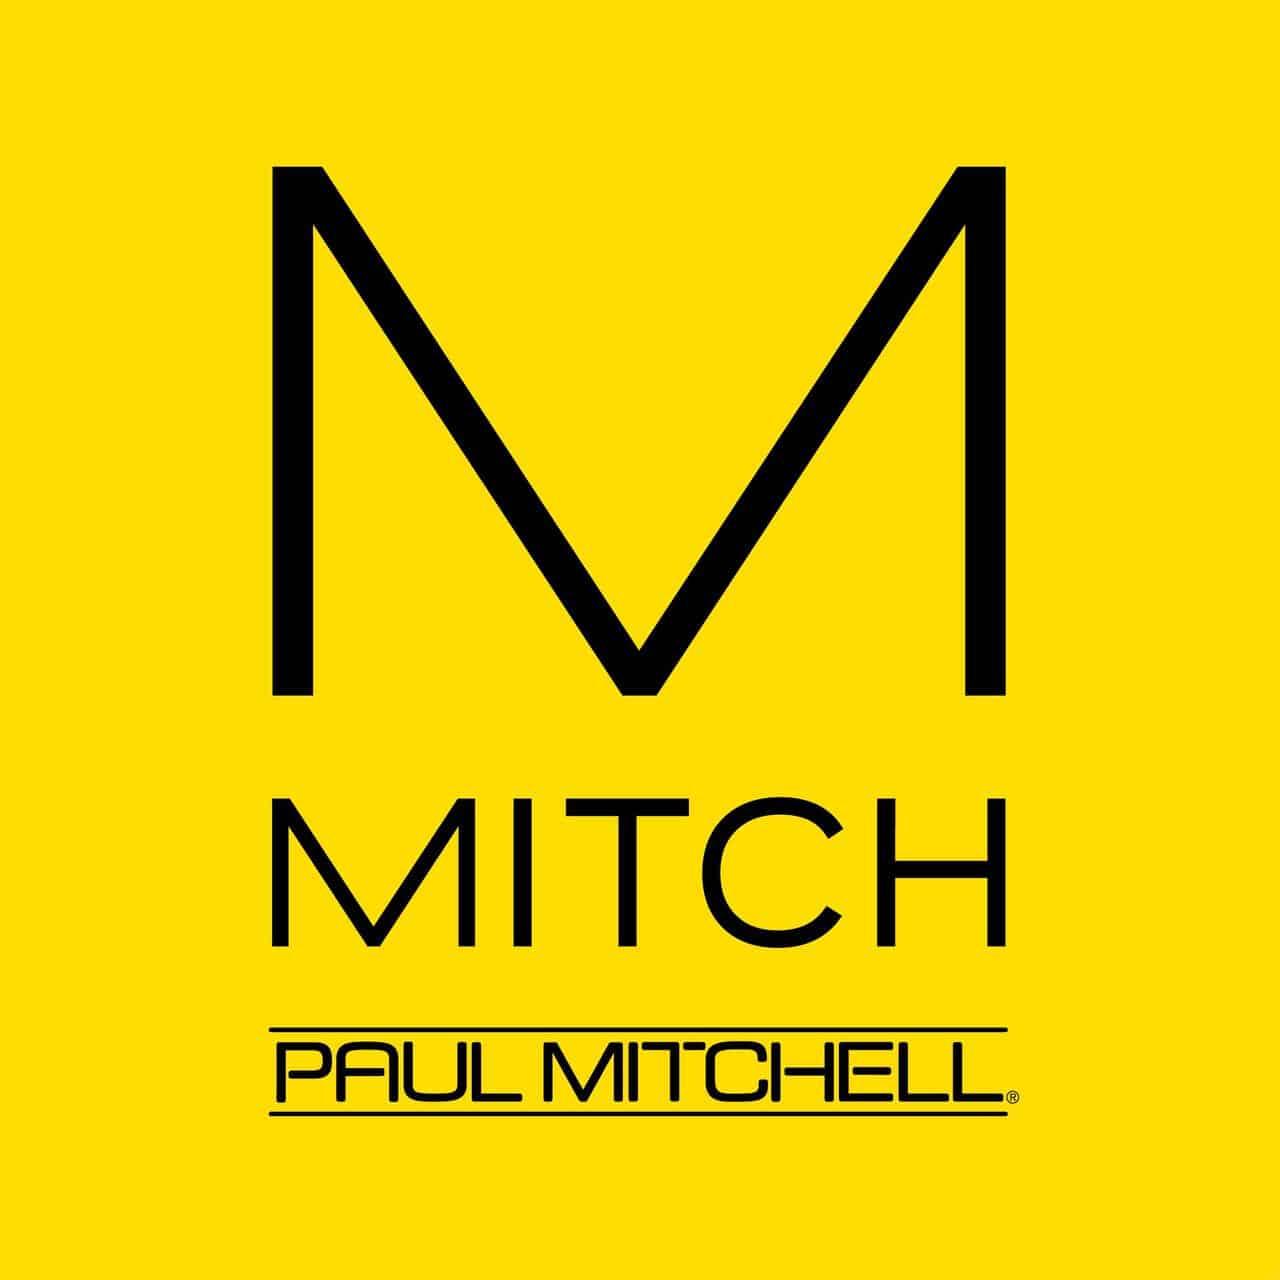 Mitch Paul Mitchell